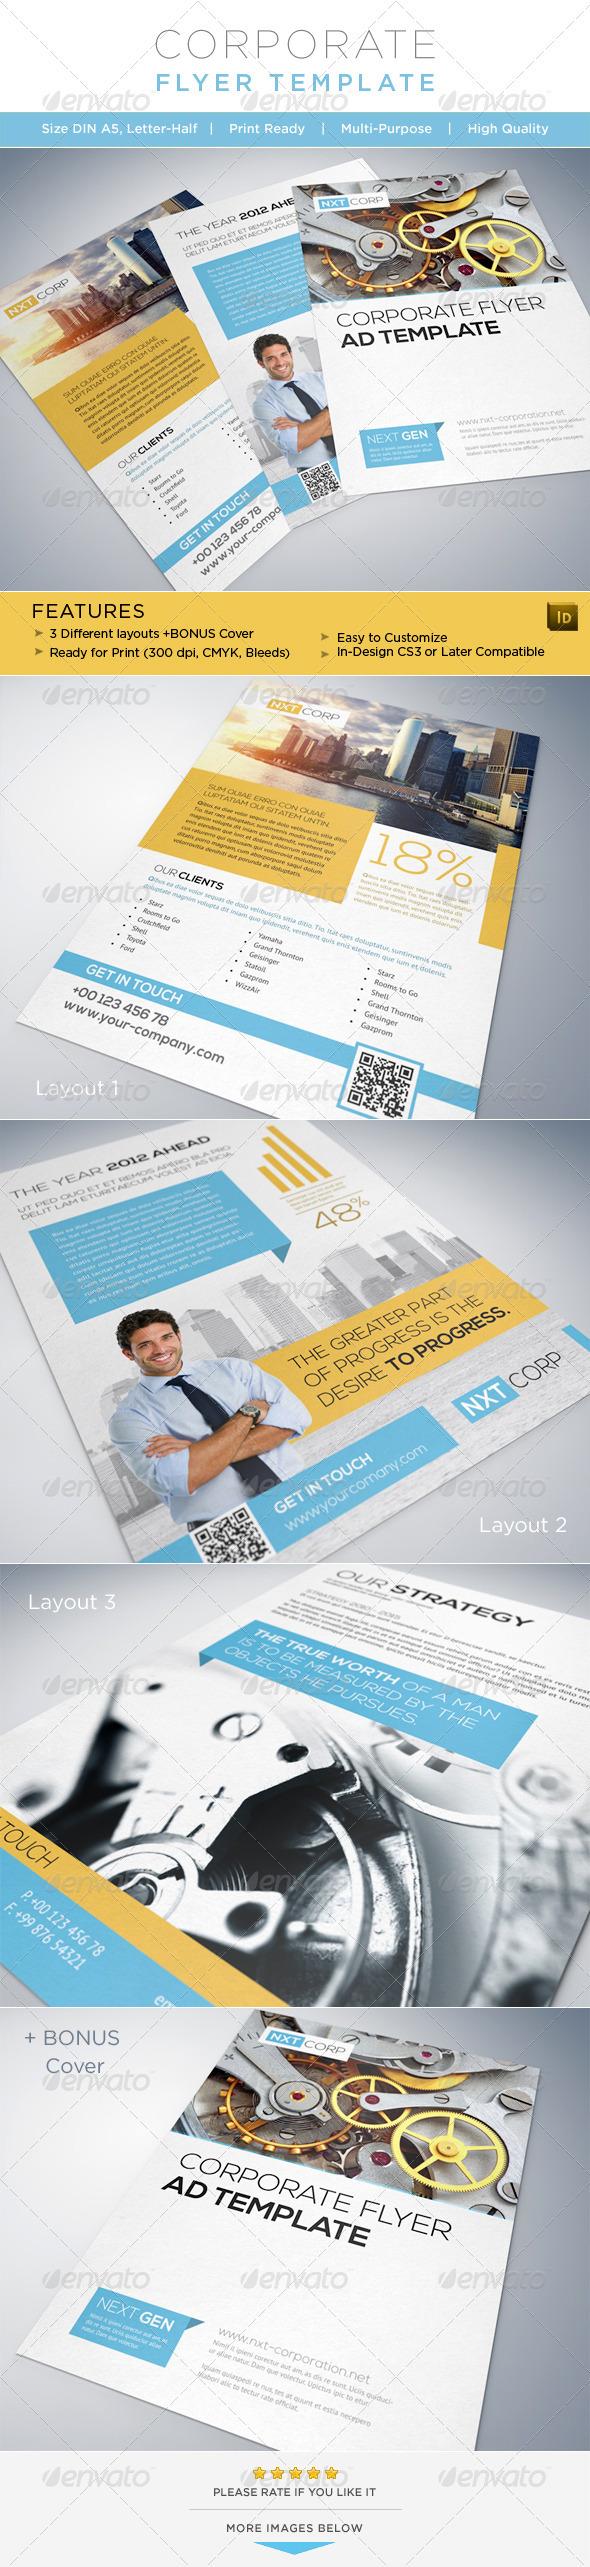 GraphicRiver Corporate Flyer AD Template 3114338